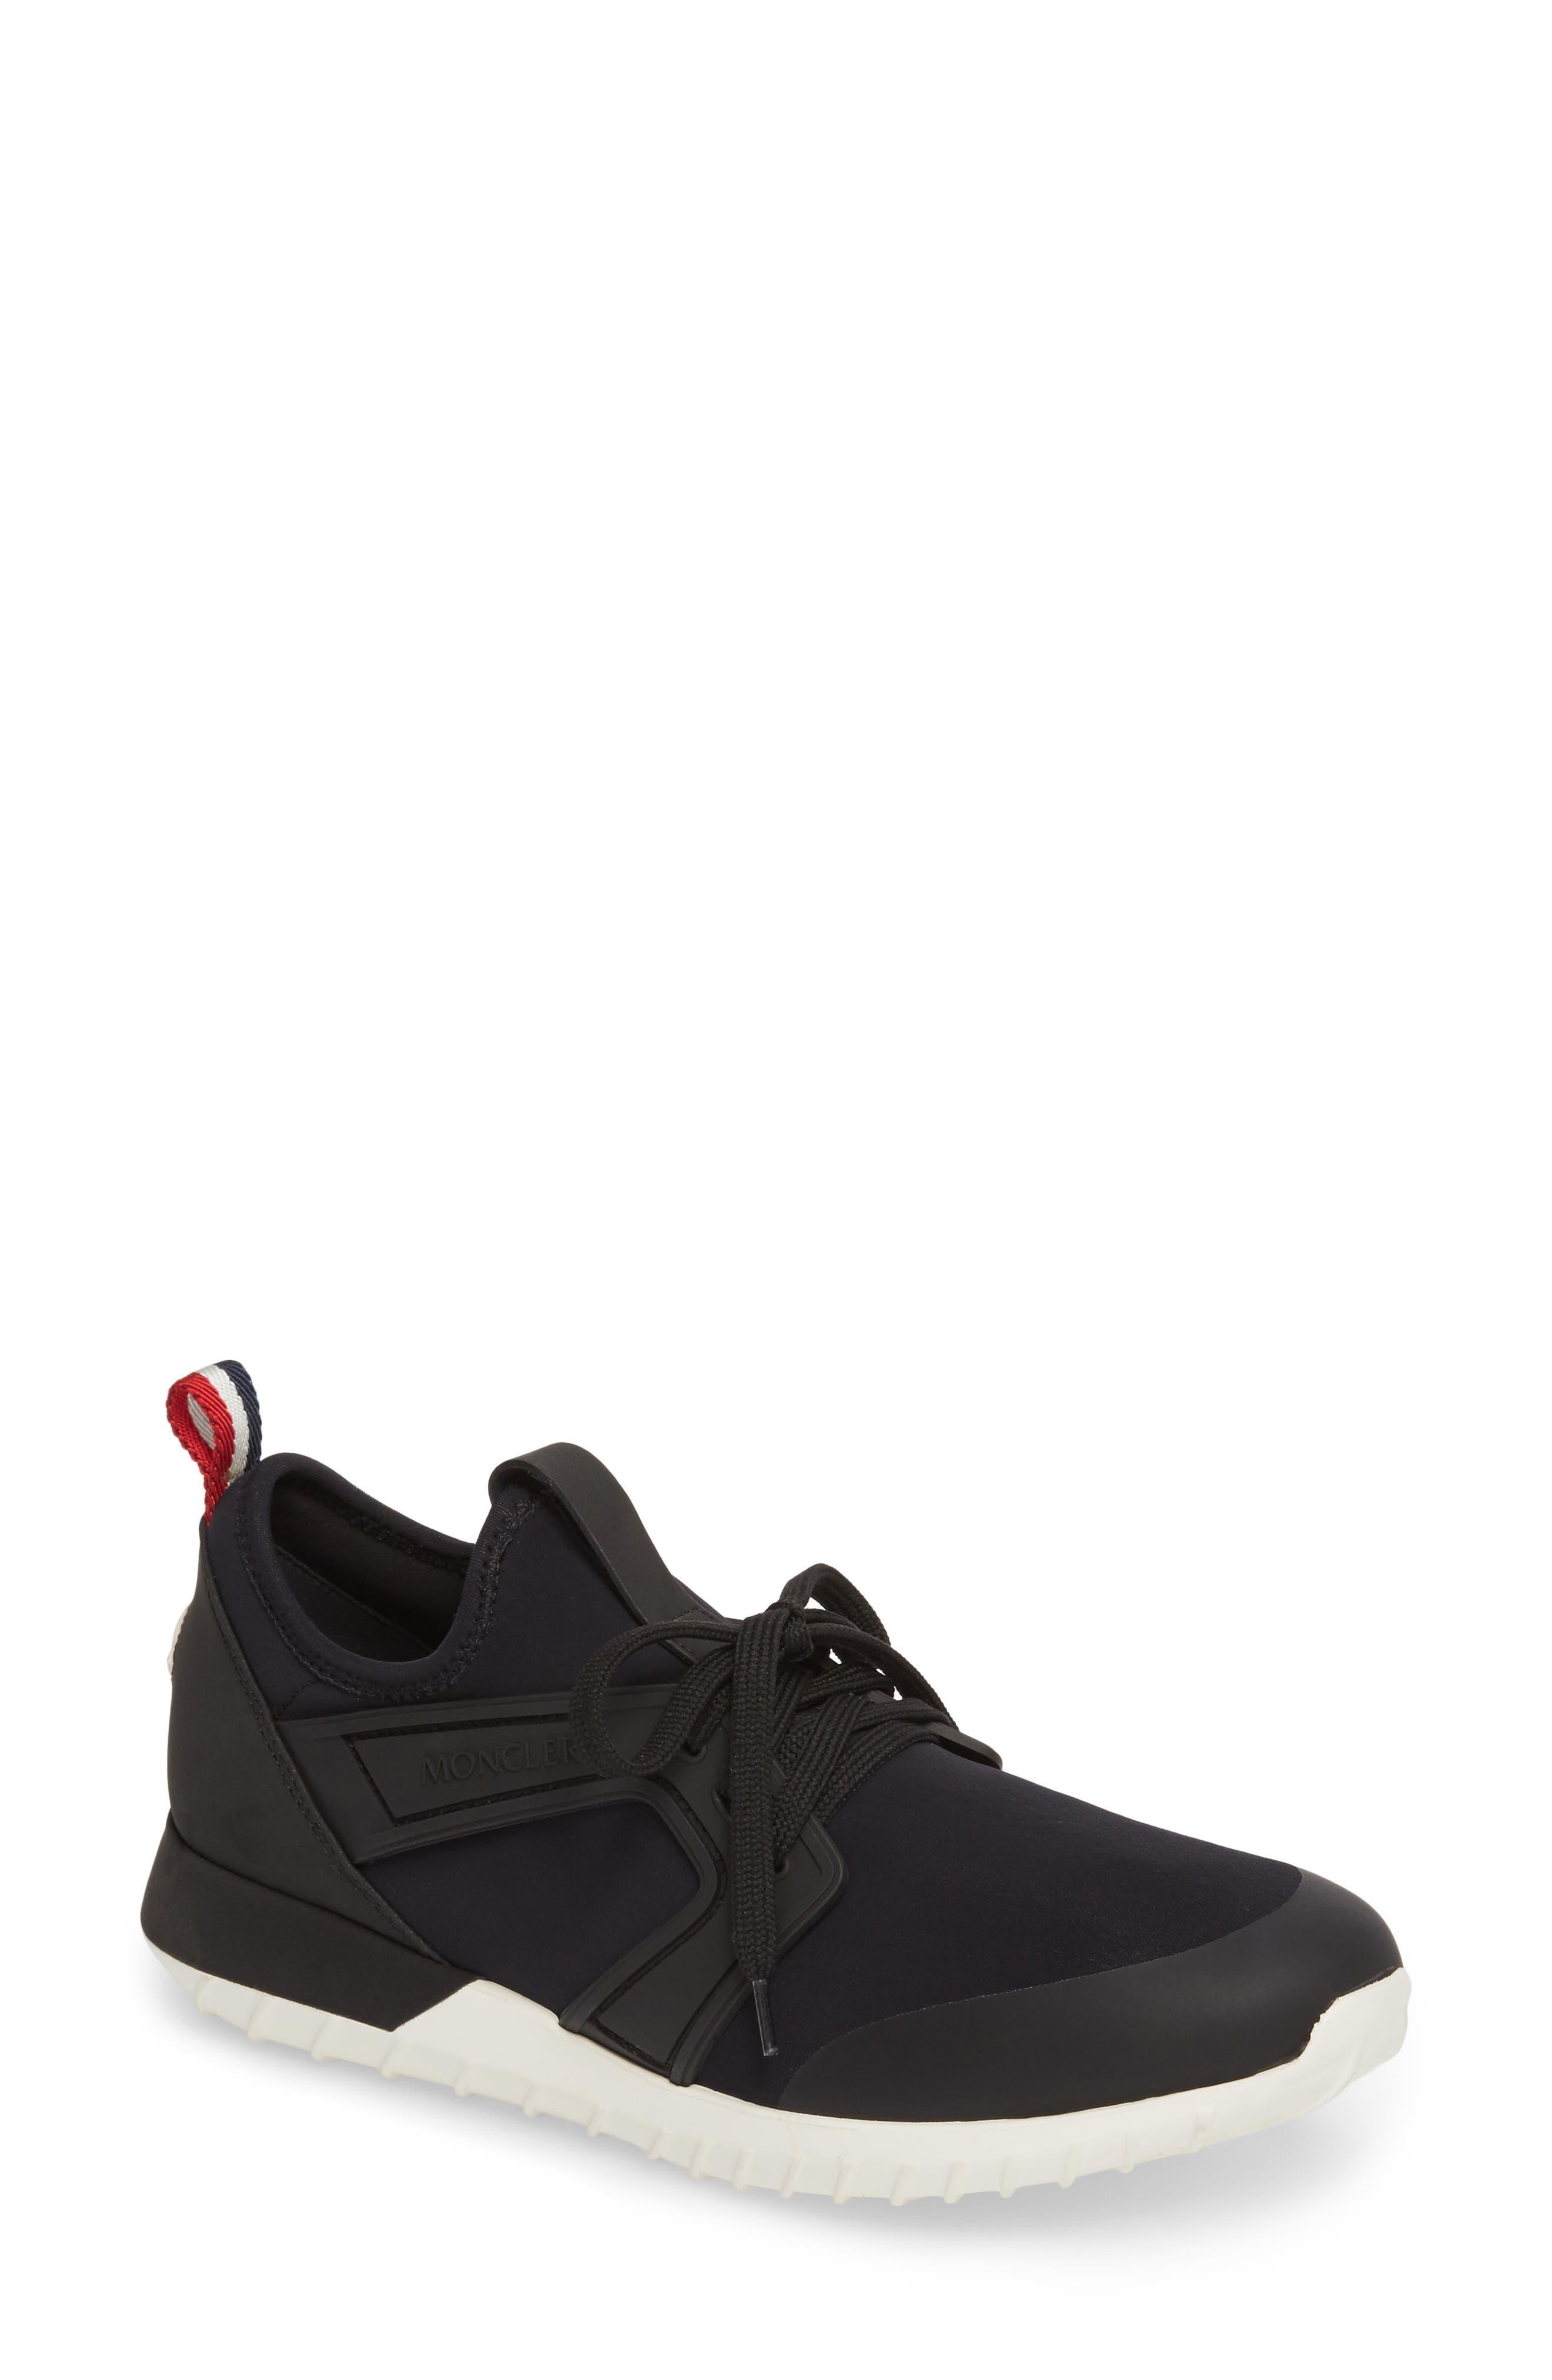 Moncler Meline Lace-Up Sneaker (Women)